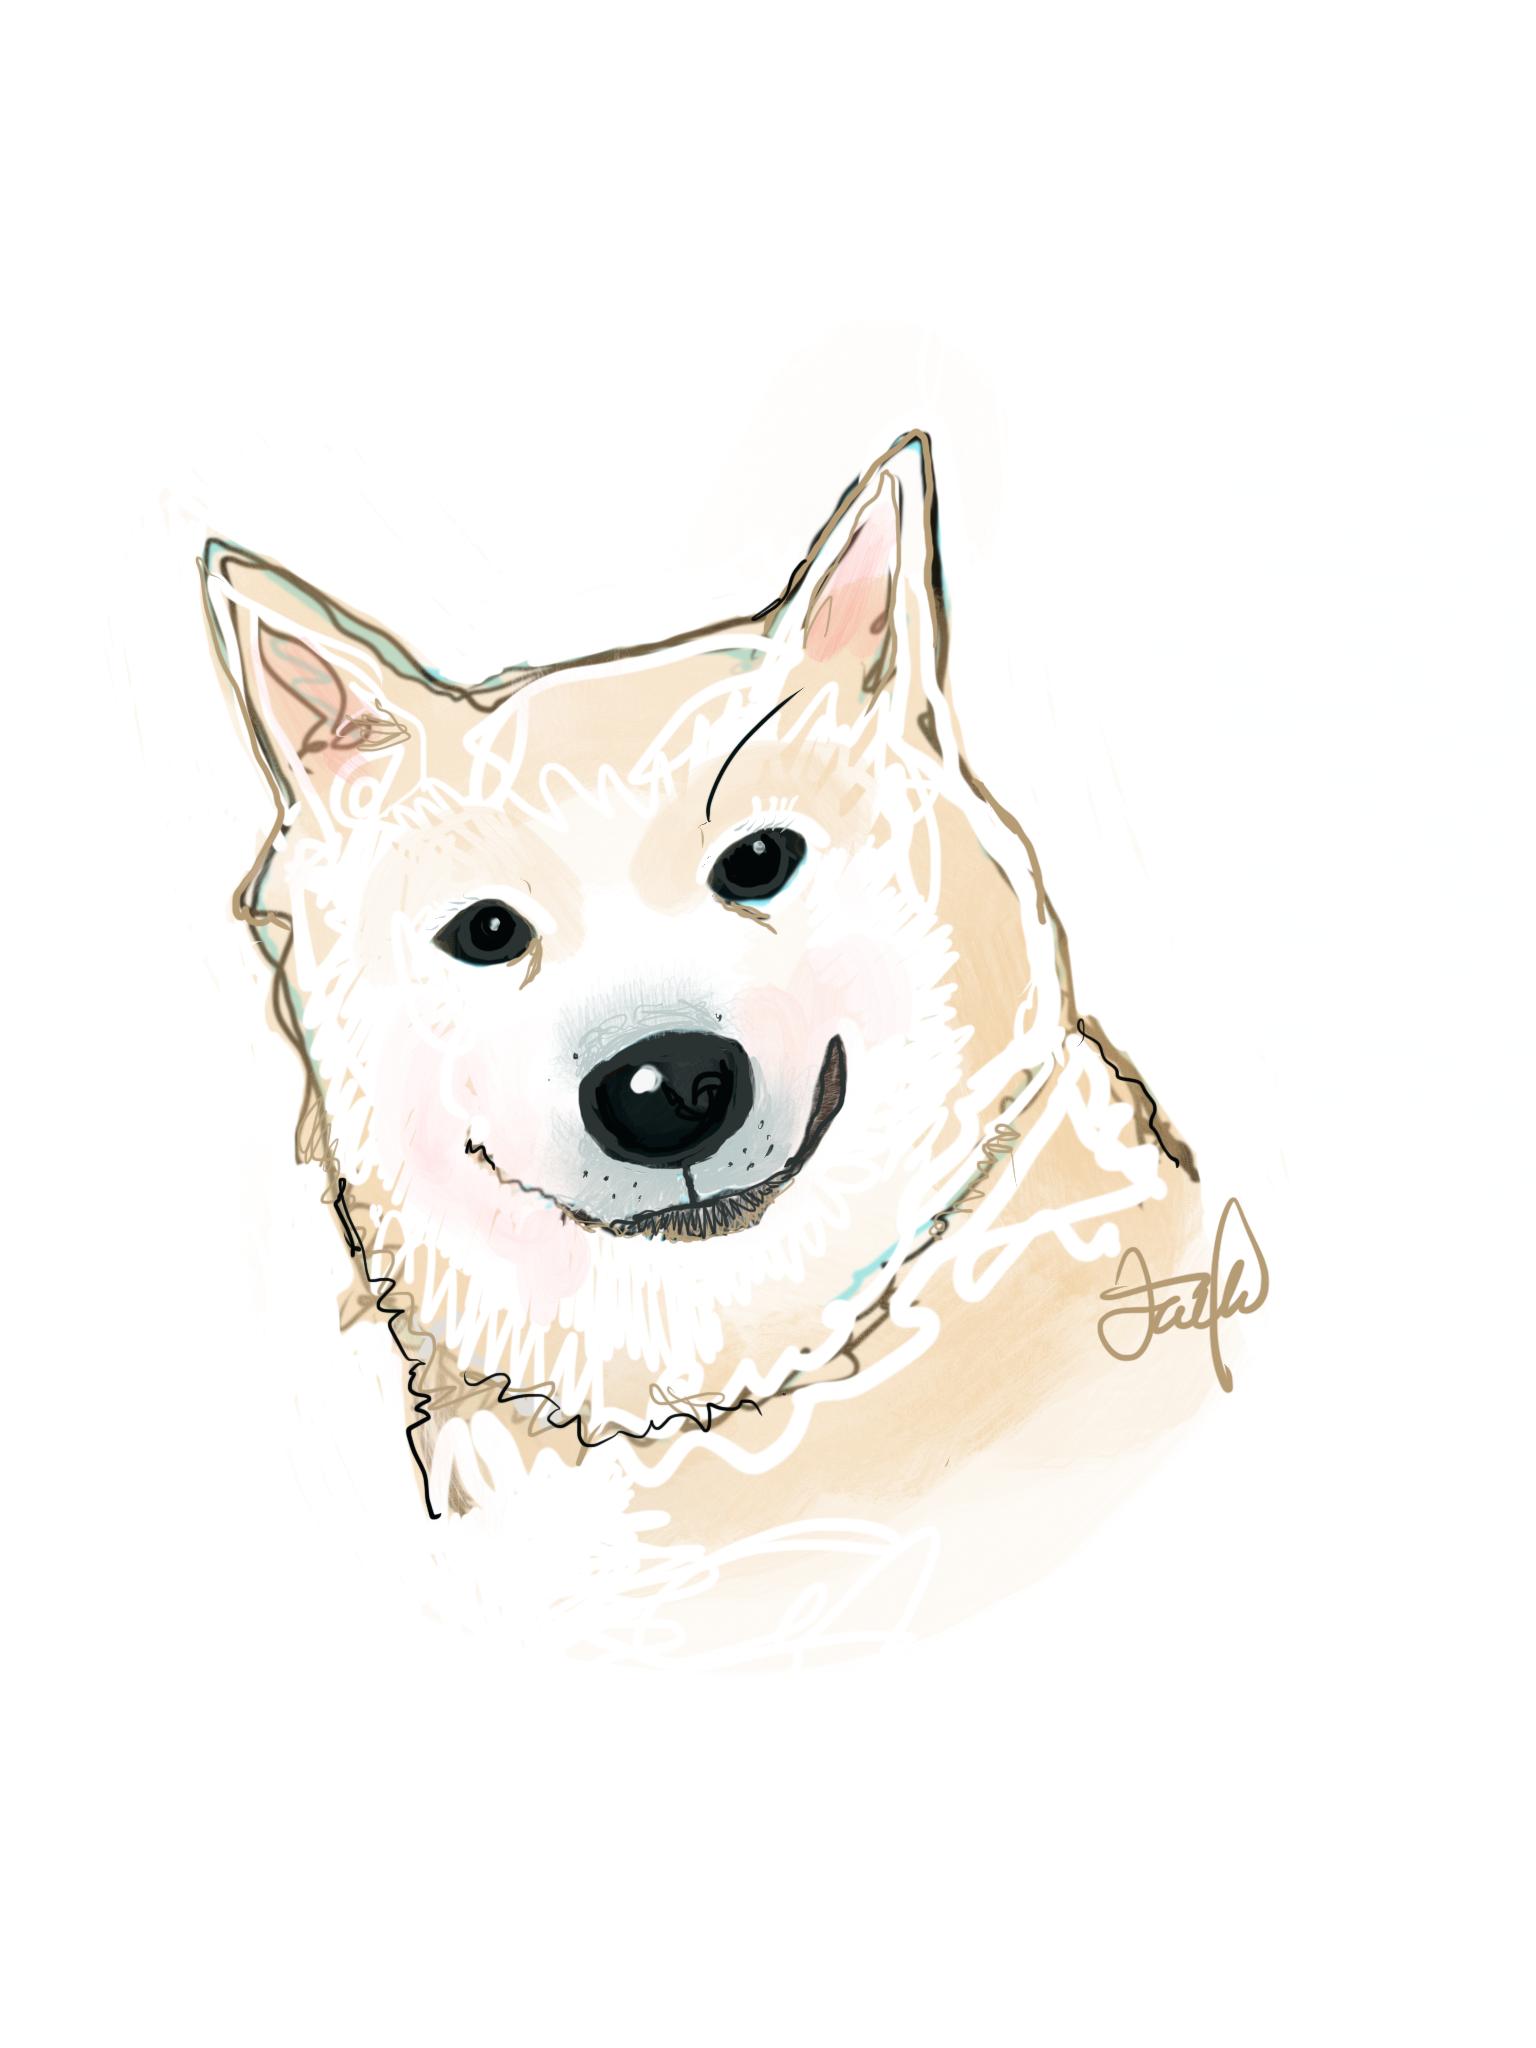 Pin By Suzanne Meow Meow Falk On Snowglobe My Shiba Inu Dog Tattoos Shiba Inu Animal Tattoo